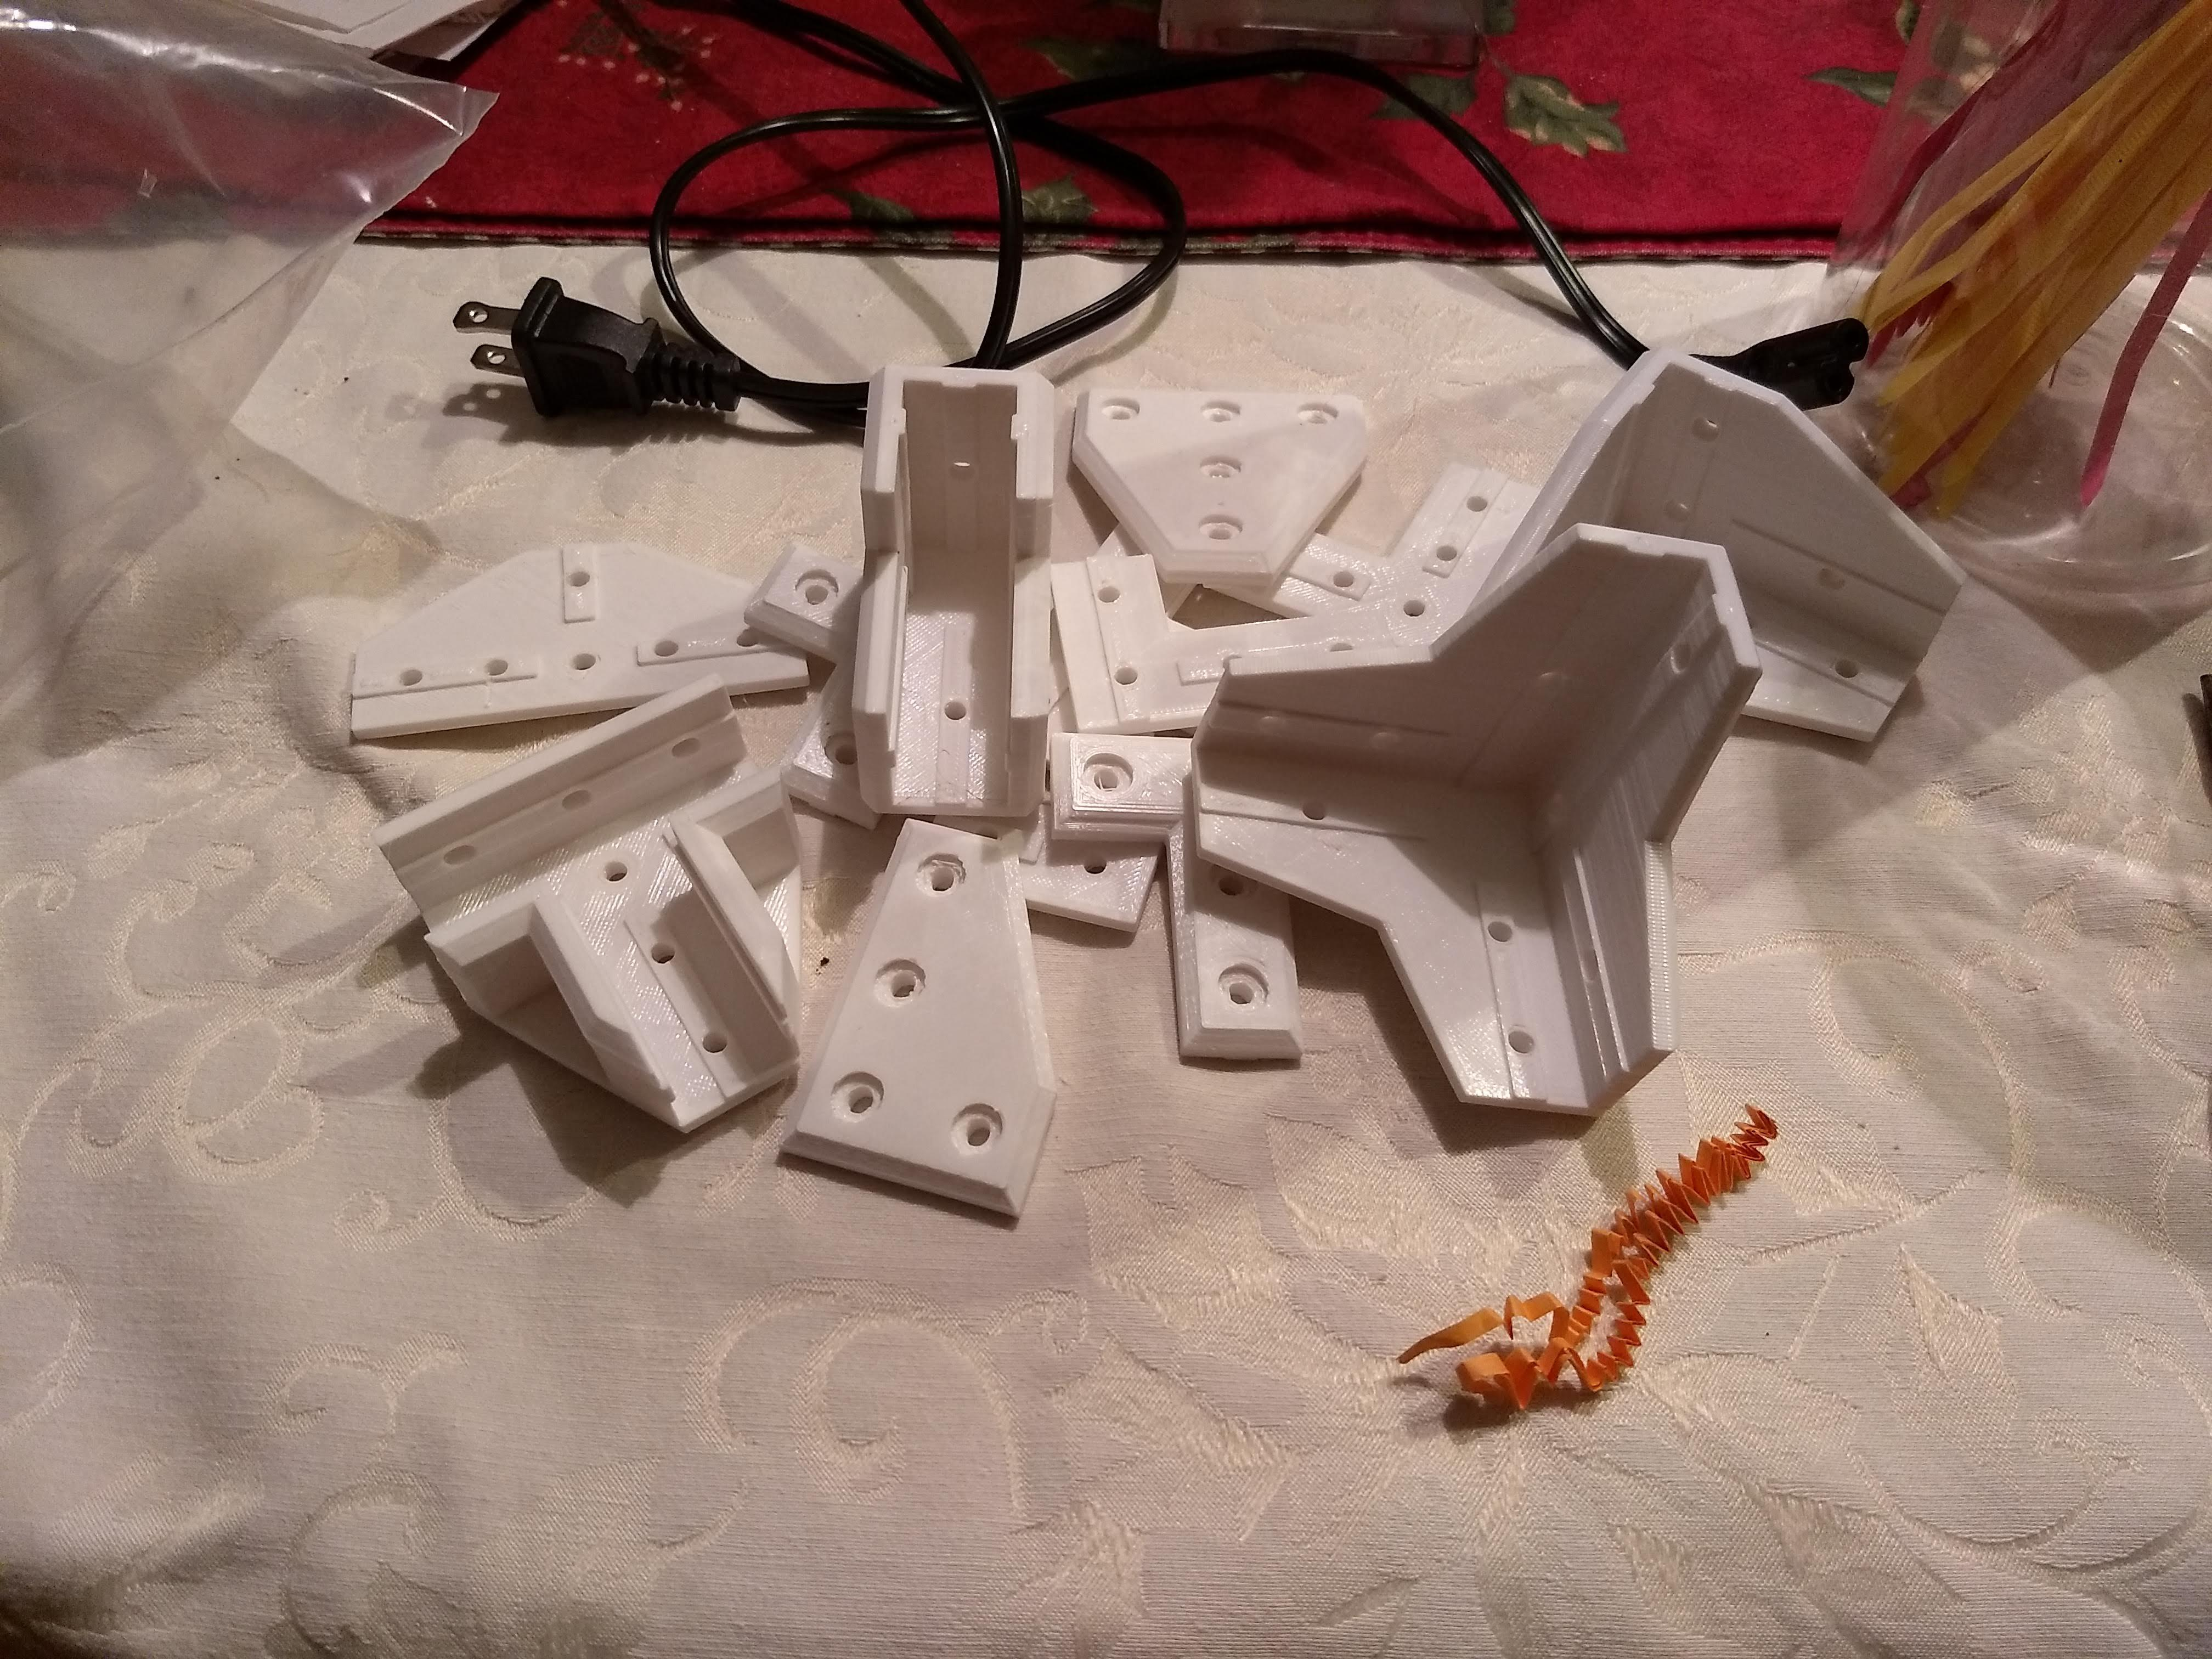 IMG_20200122_171230593.jpg Download free STL file 2020 Profile Aluminum 3D Printable Erector Set • 3D printer model, adamjvr